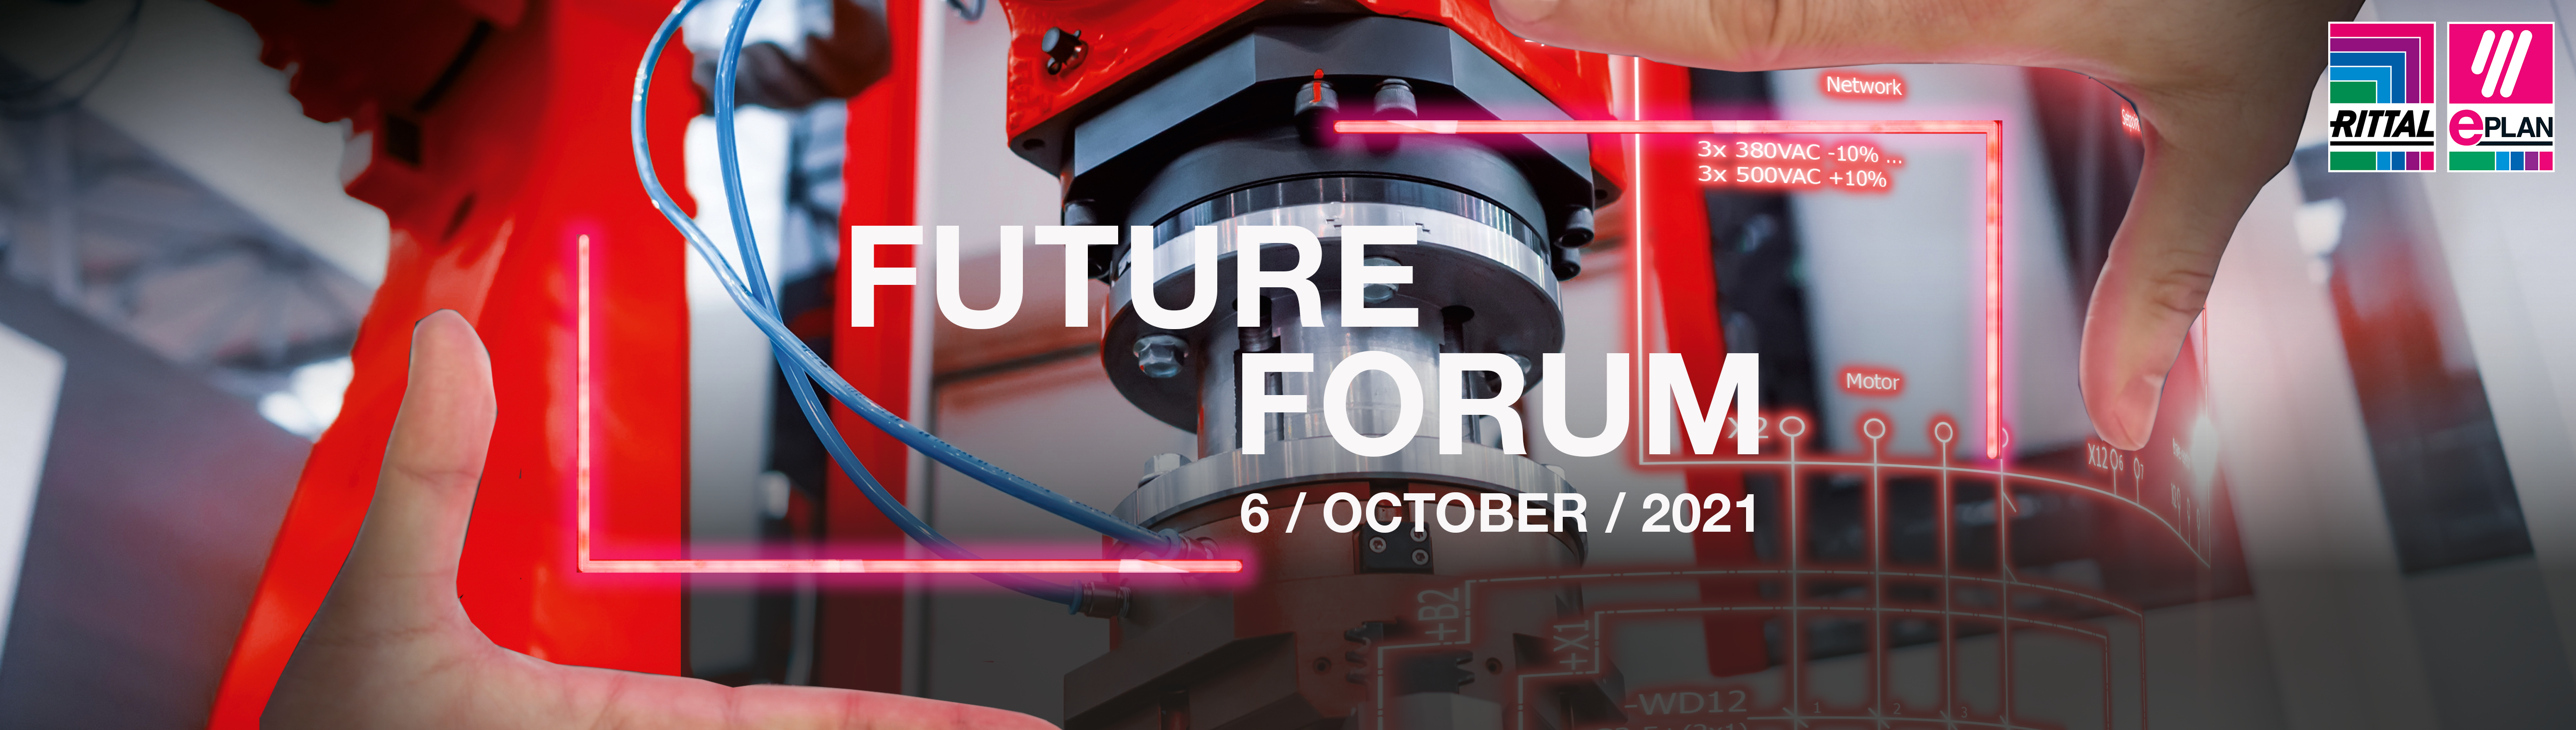 Future Forum Microsite Image Pink logo